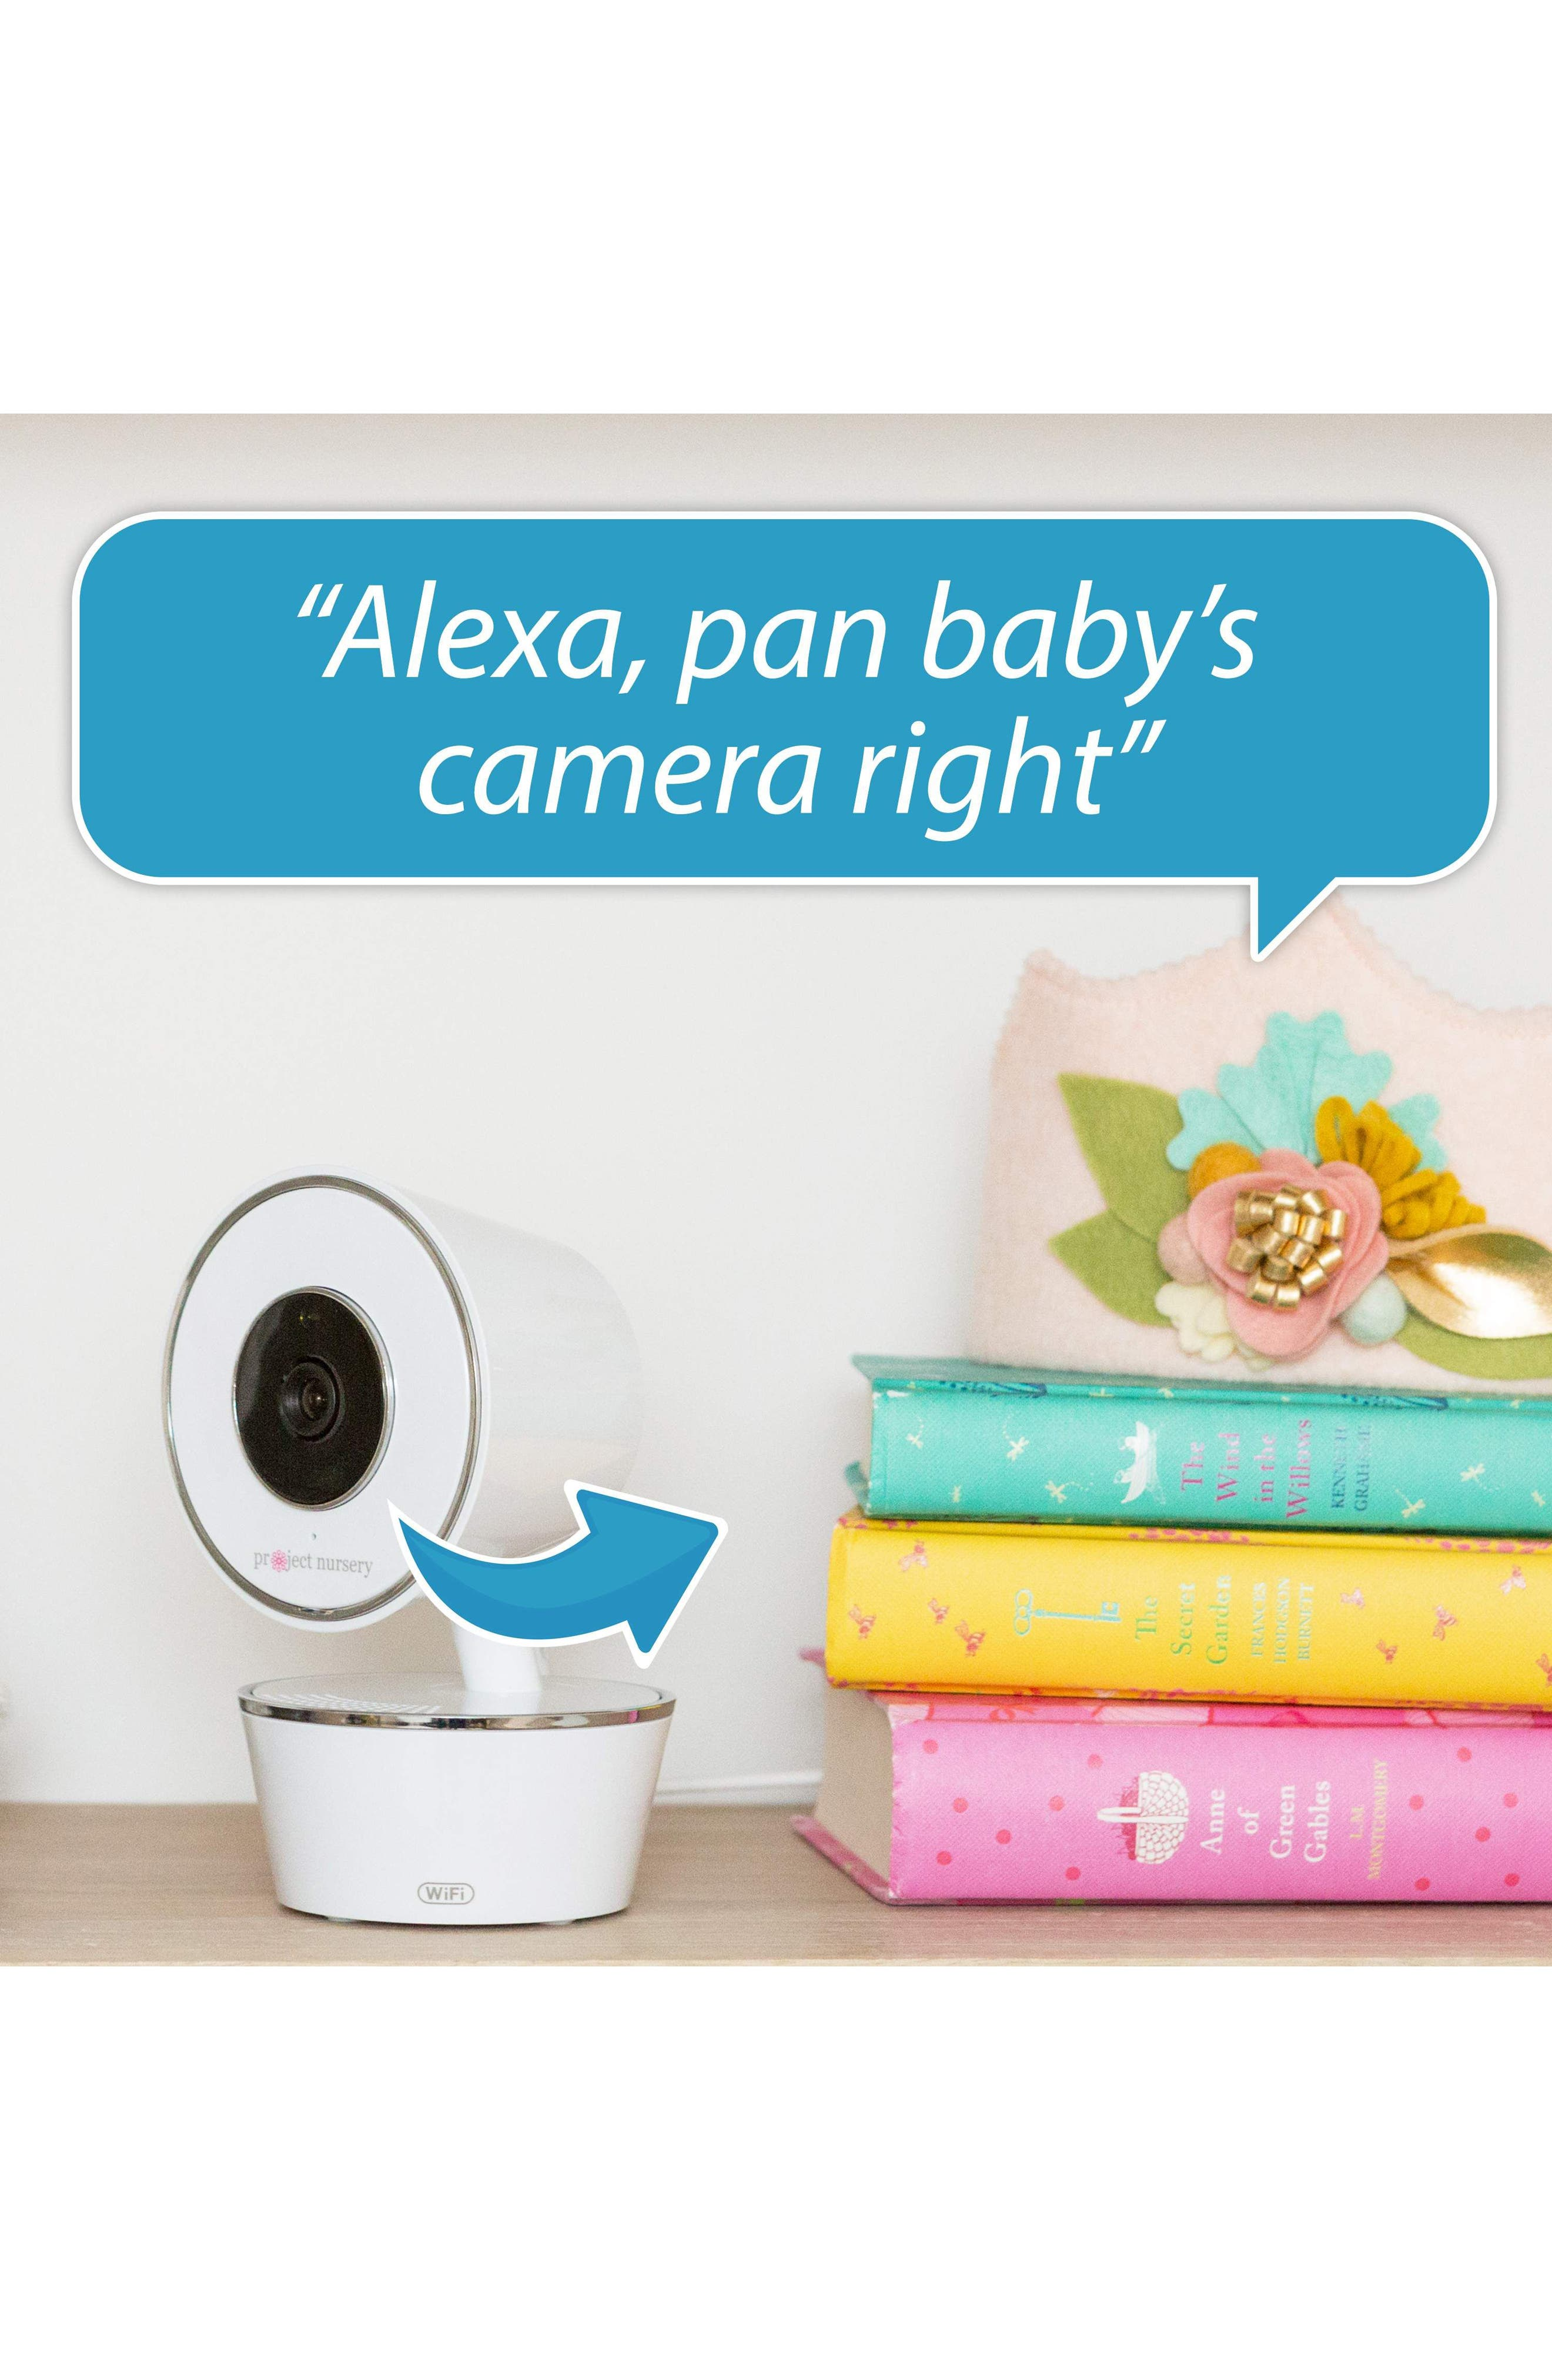 Smart Nursery Wi-Fi Baby Monitor,                             Alternate thumbnail 8, color,                             WHITE